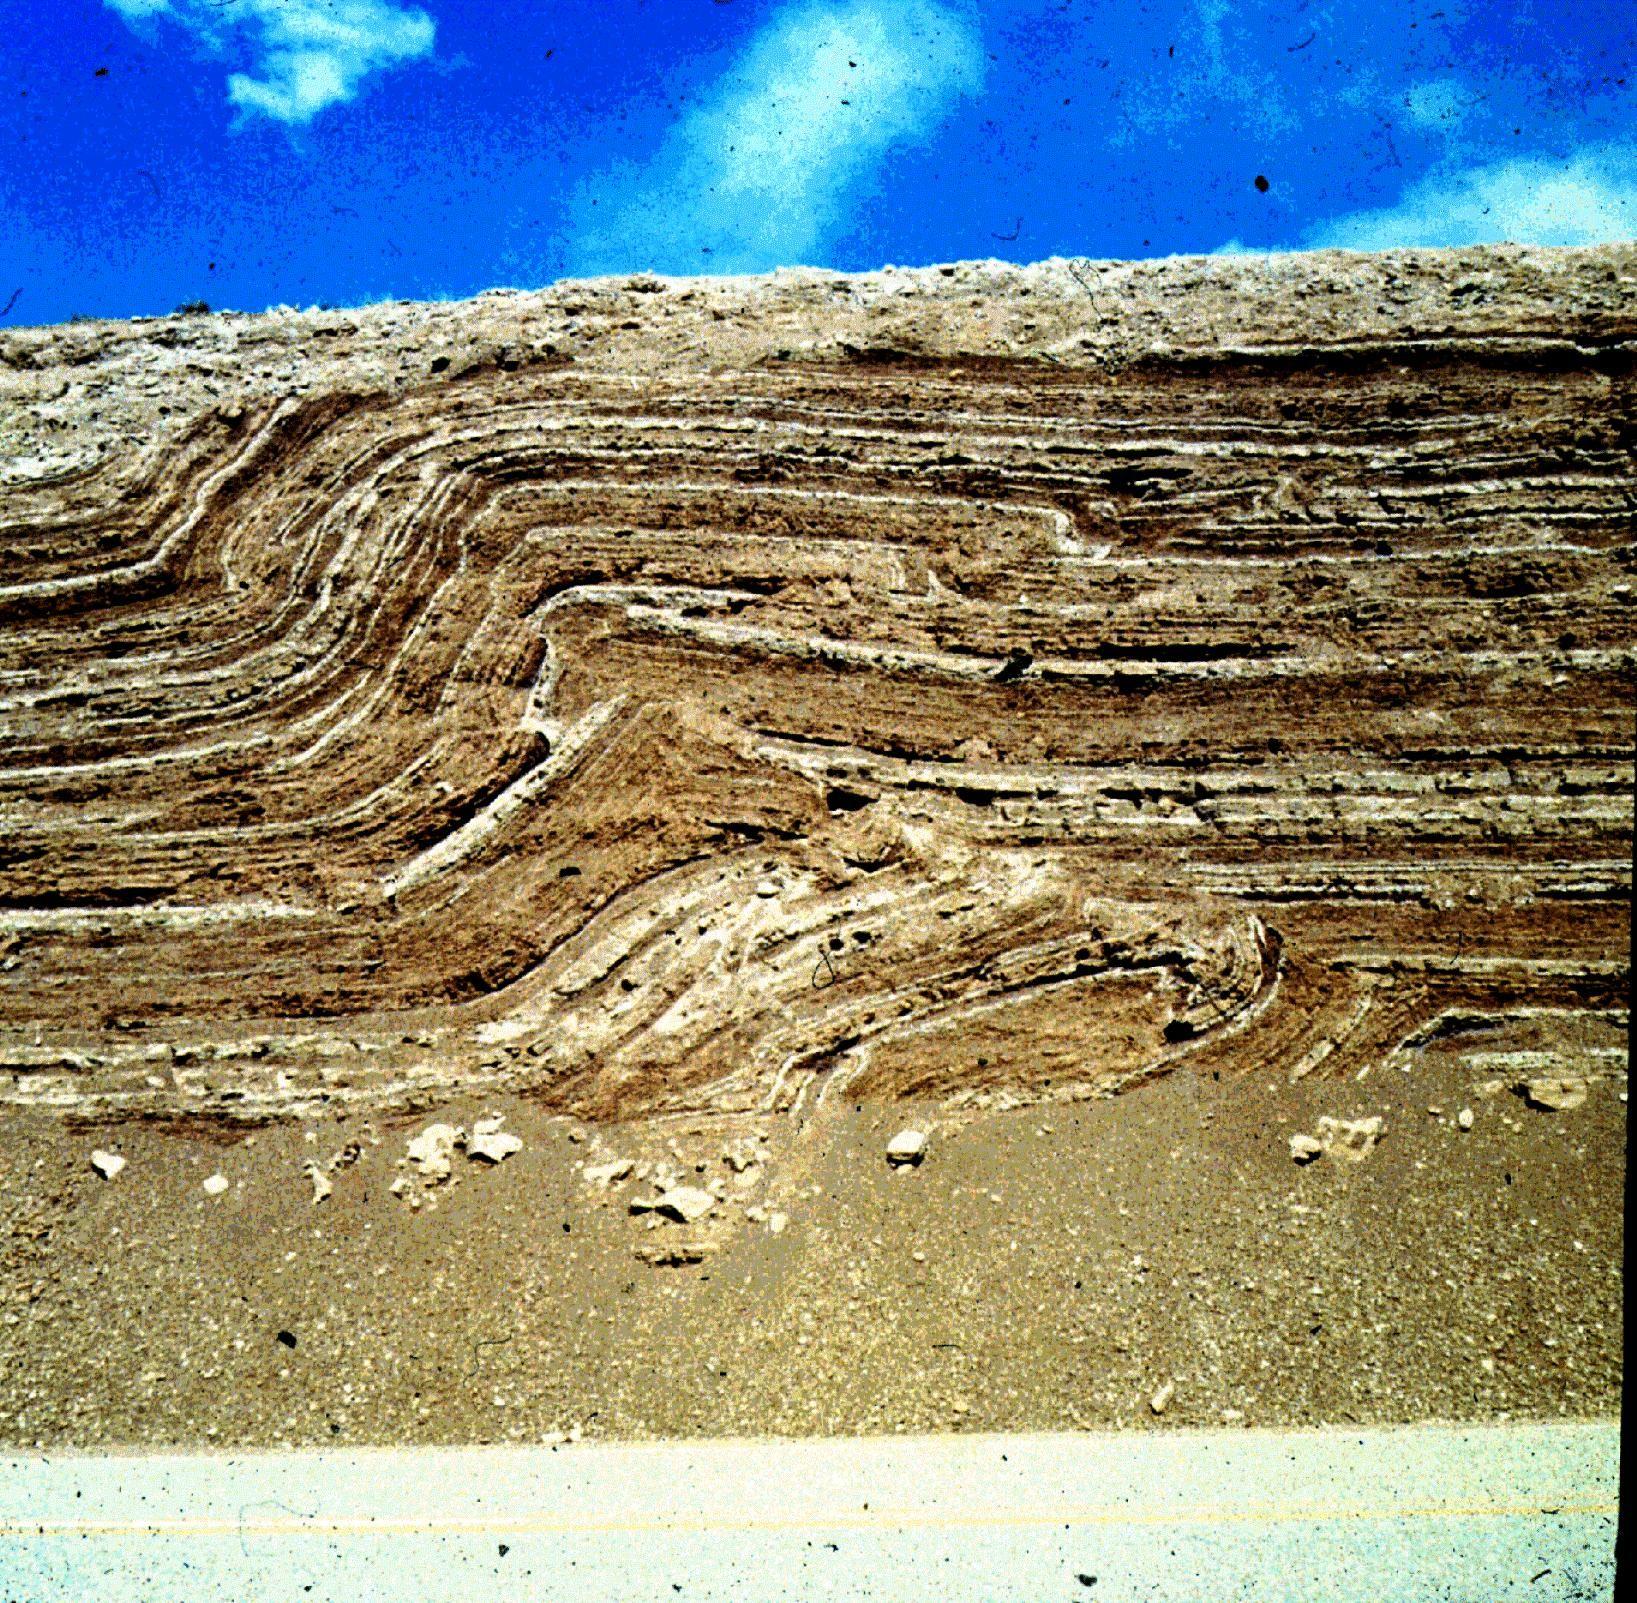 Geological Folding Involves The Plastic Deformation Bending